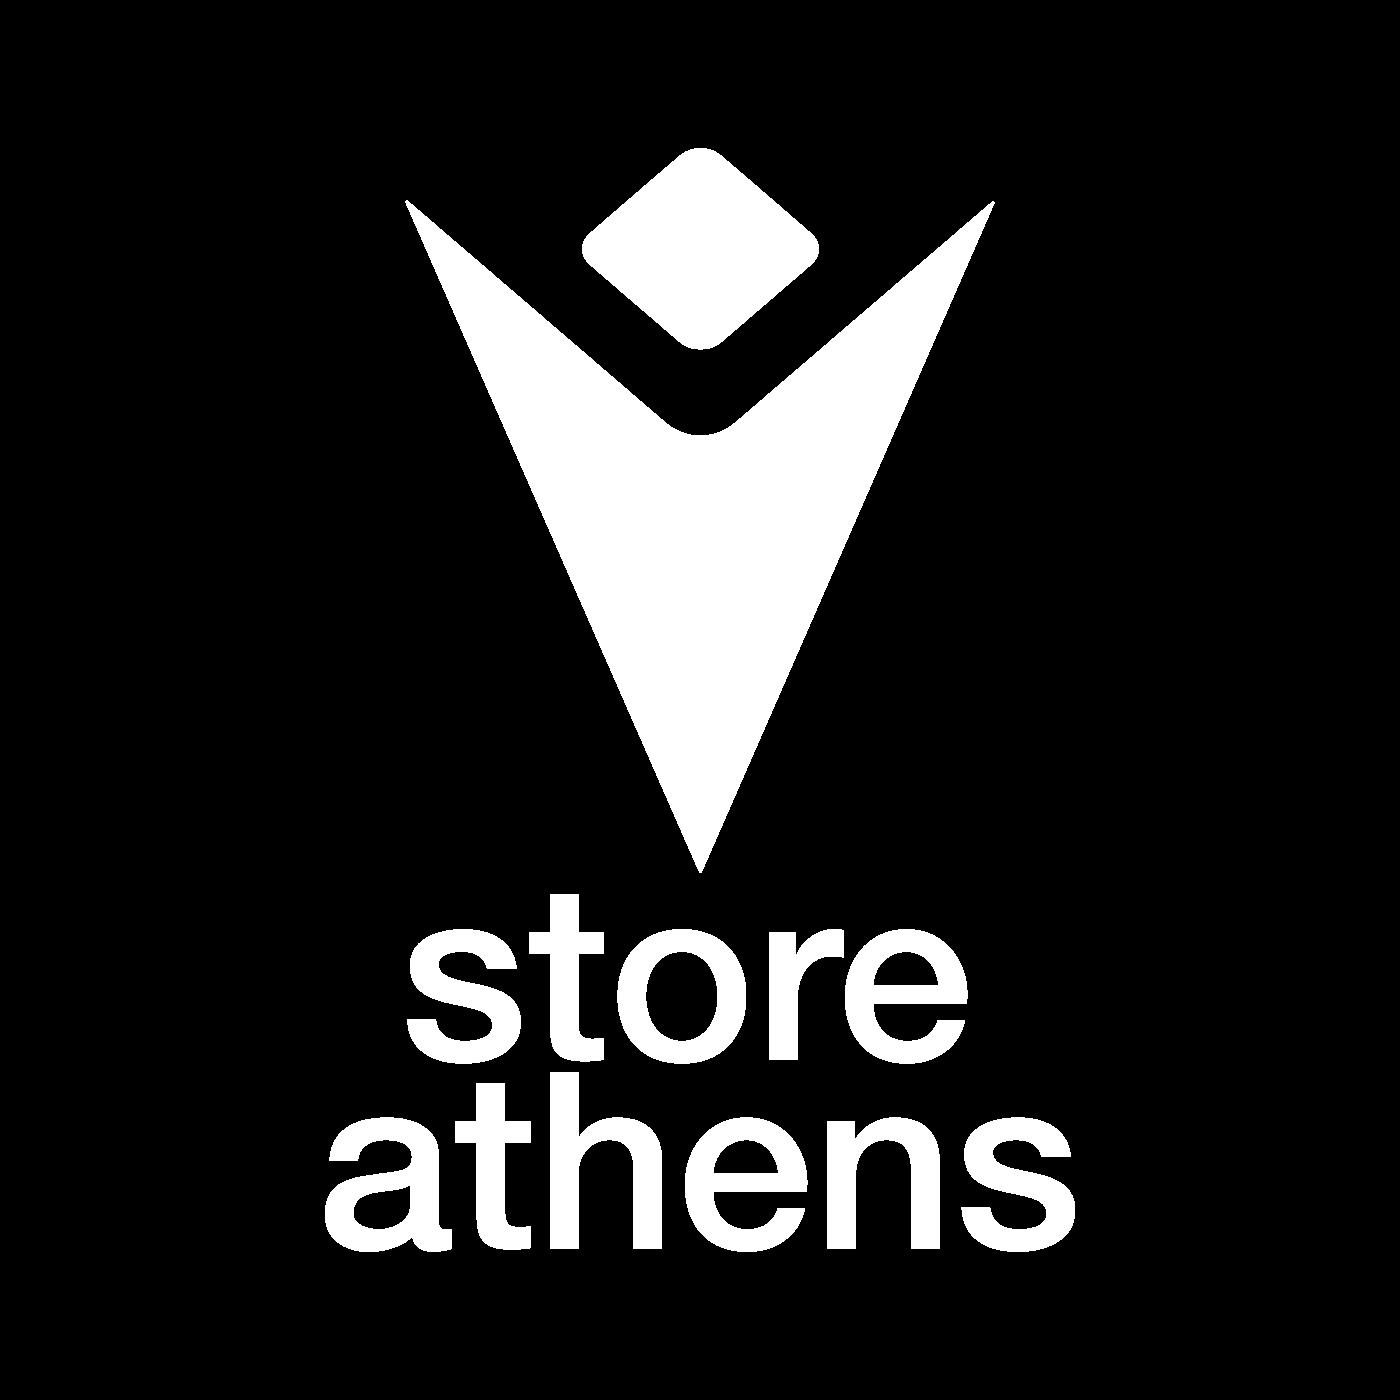 Macron Athens Store Logotype